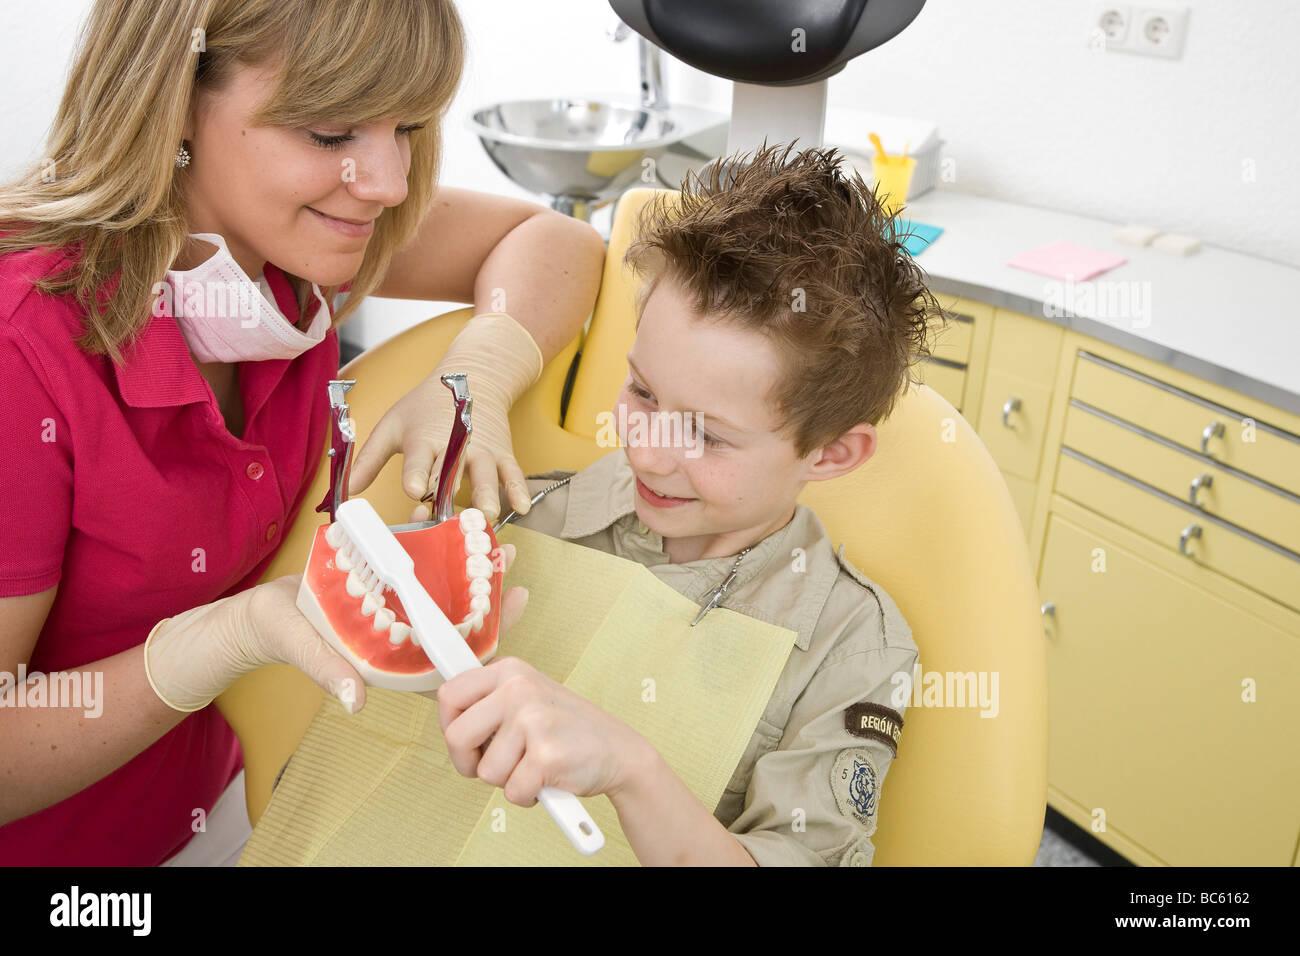 Boy at dentist - Stock Image